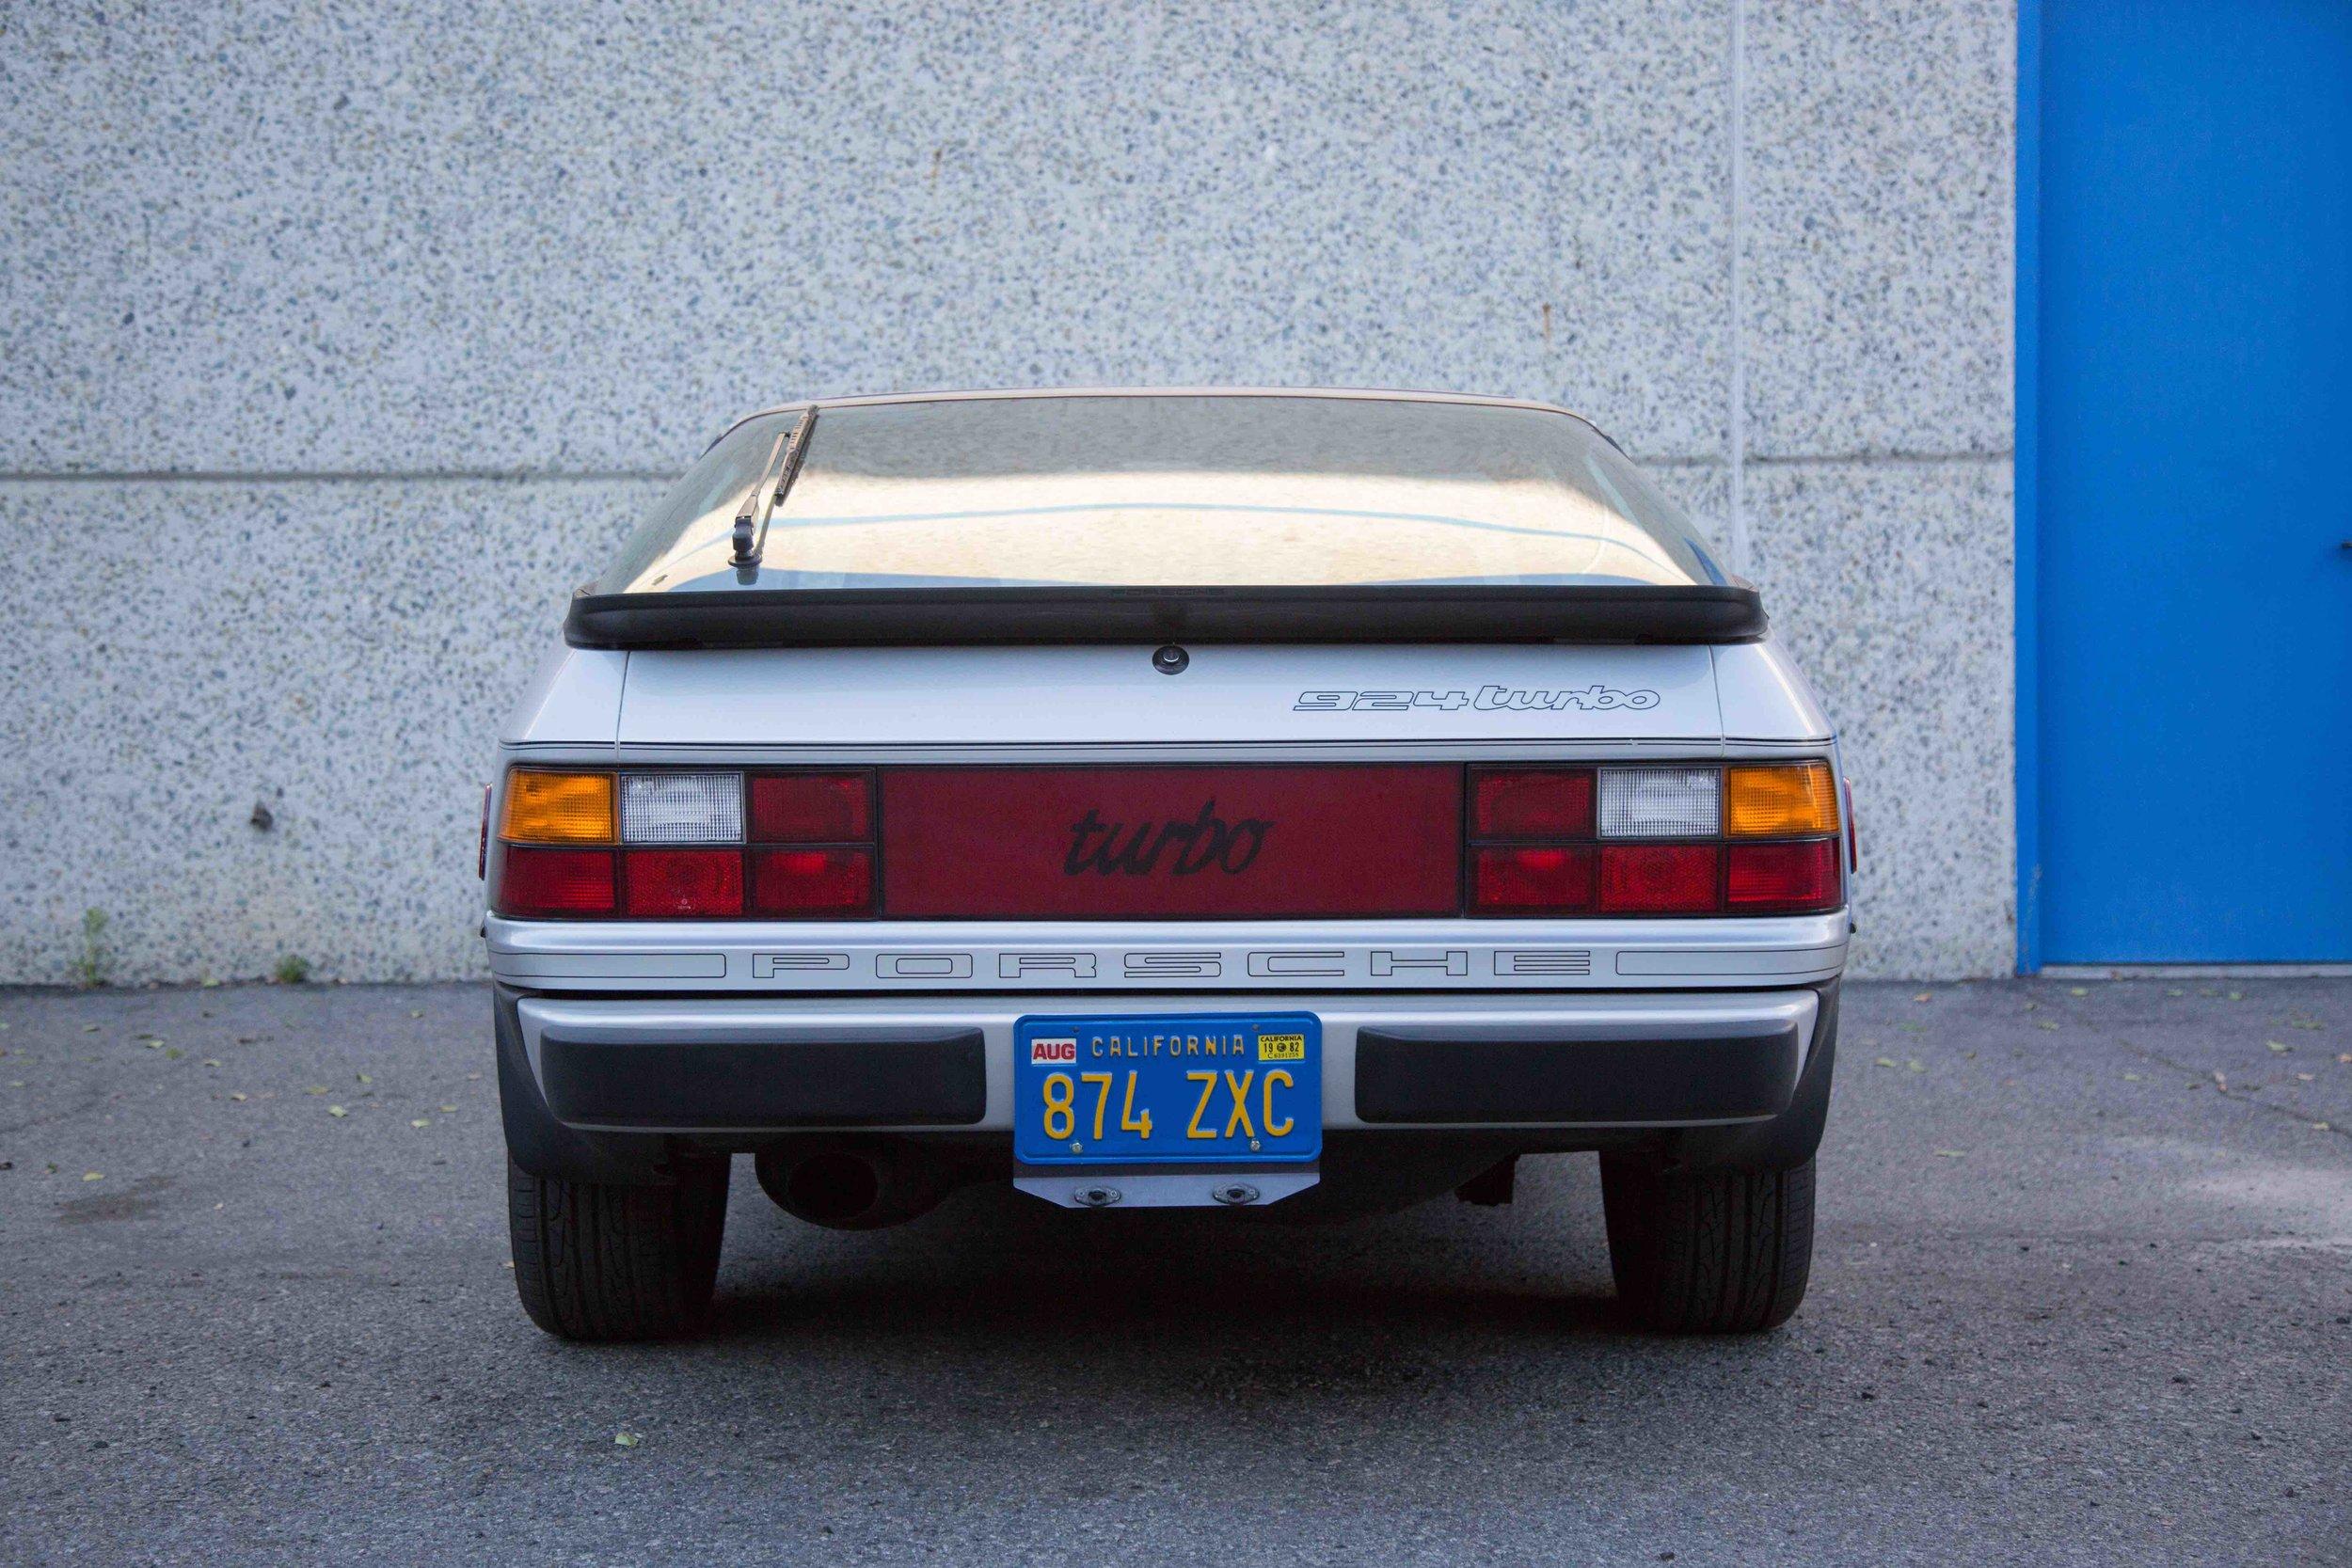 1980-924-Turbo-rear-bumper-view-makellos-classics.jpeg